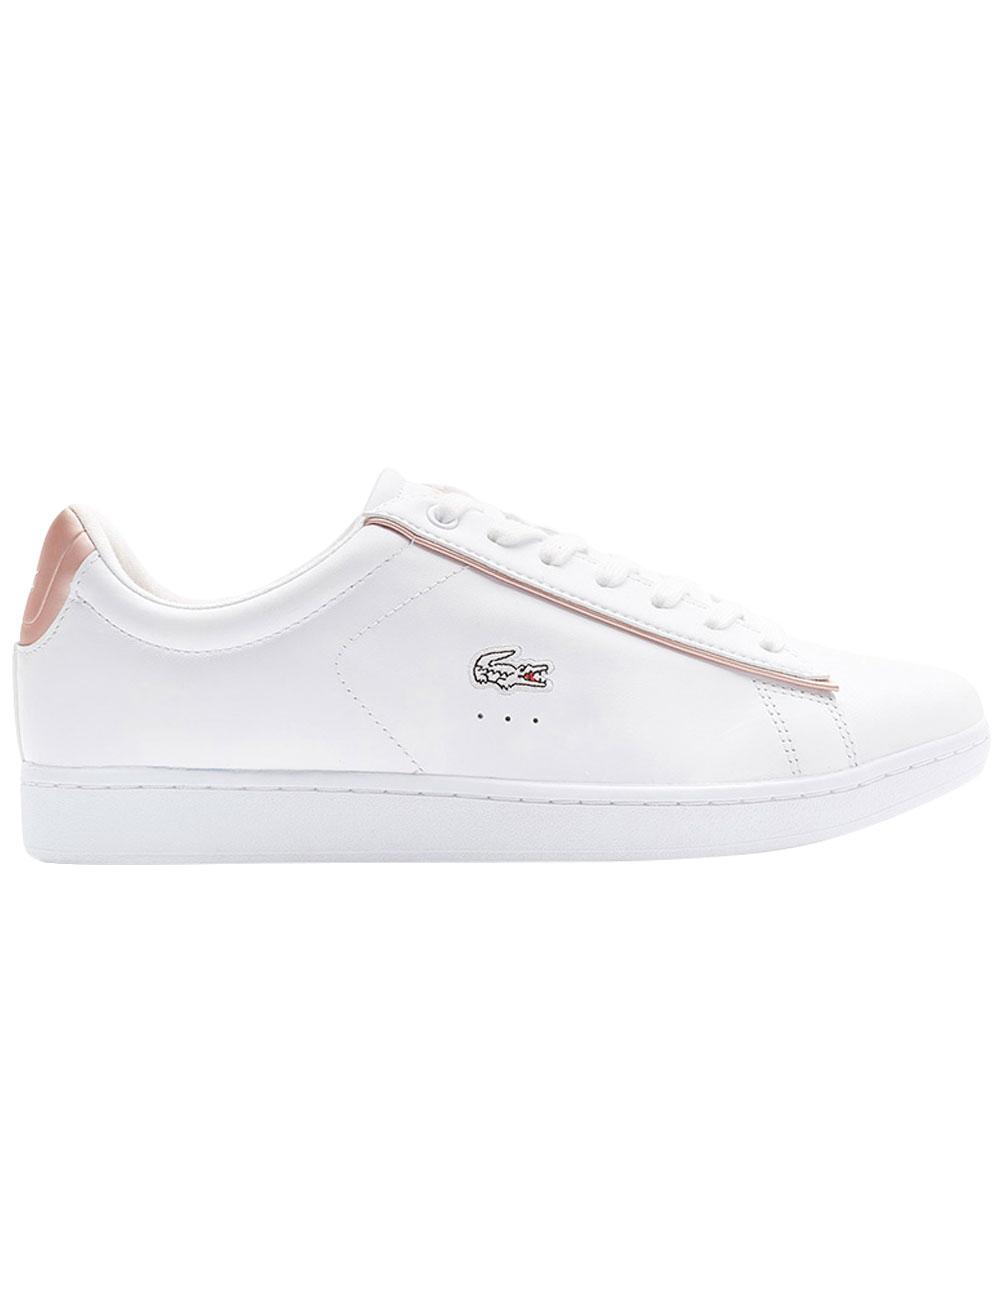 best service c3580 c391c Damen-Sneakers, Lacoste, weiss